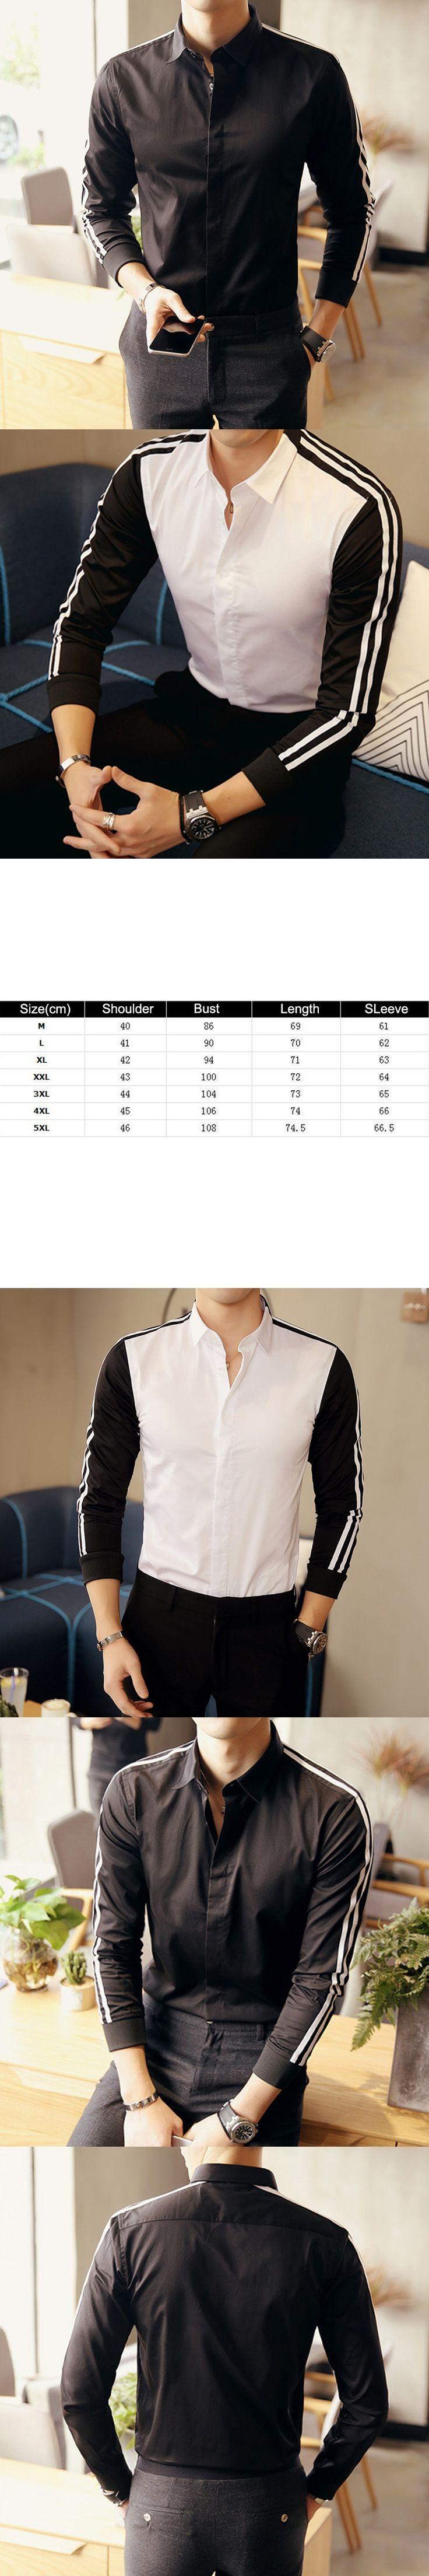 Turn Down Collar Striped Long Sleeve Shirt Color Block Business Men Slim Fit Top